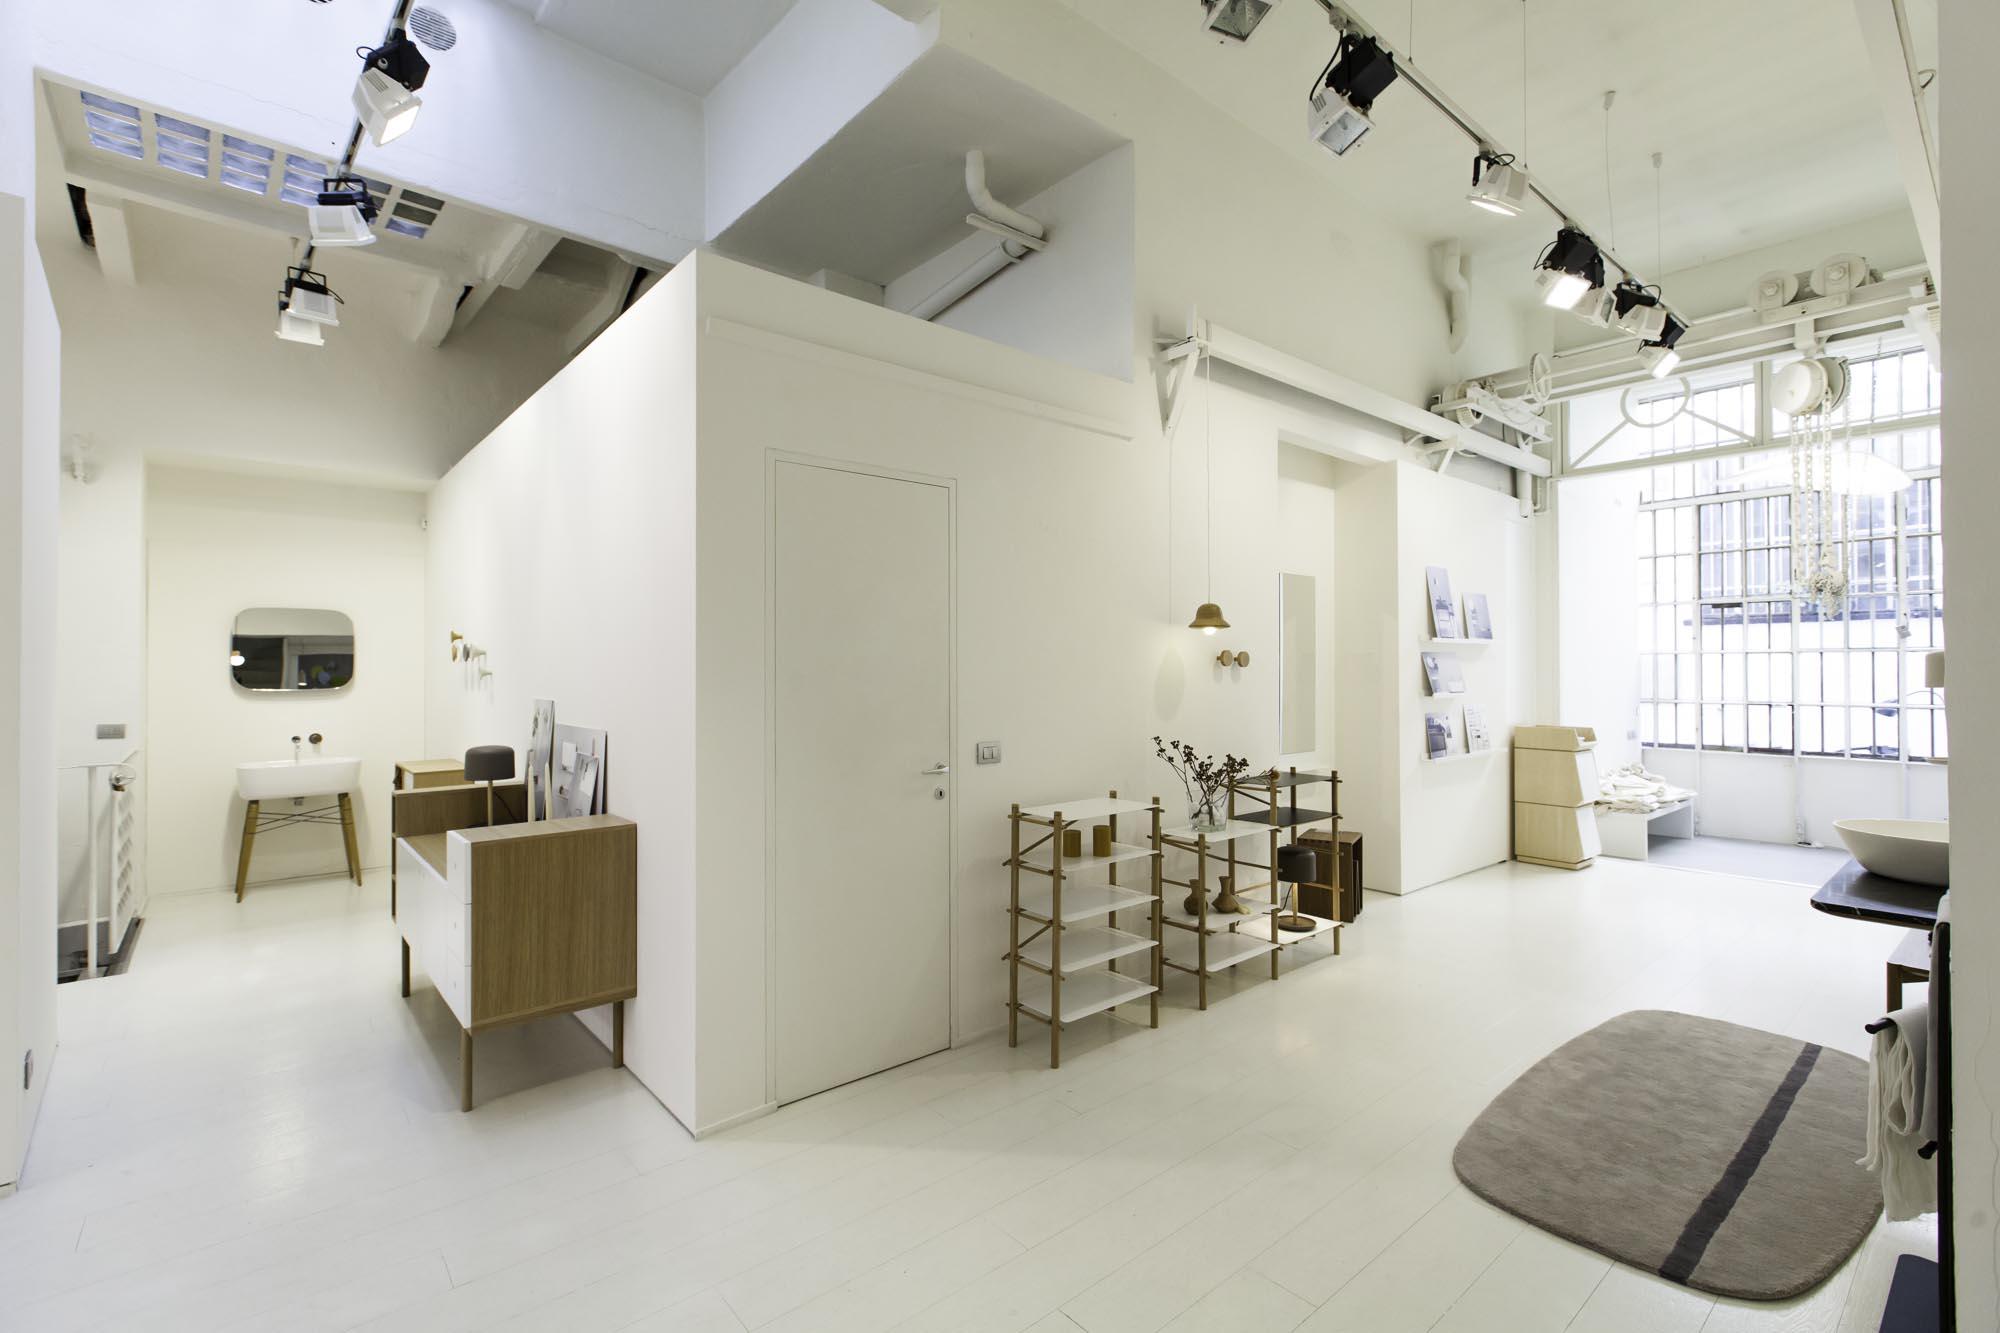 Uanof studio uanof studio produzione video e studio fotografico milano - Studi architettura d interni milano ...